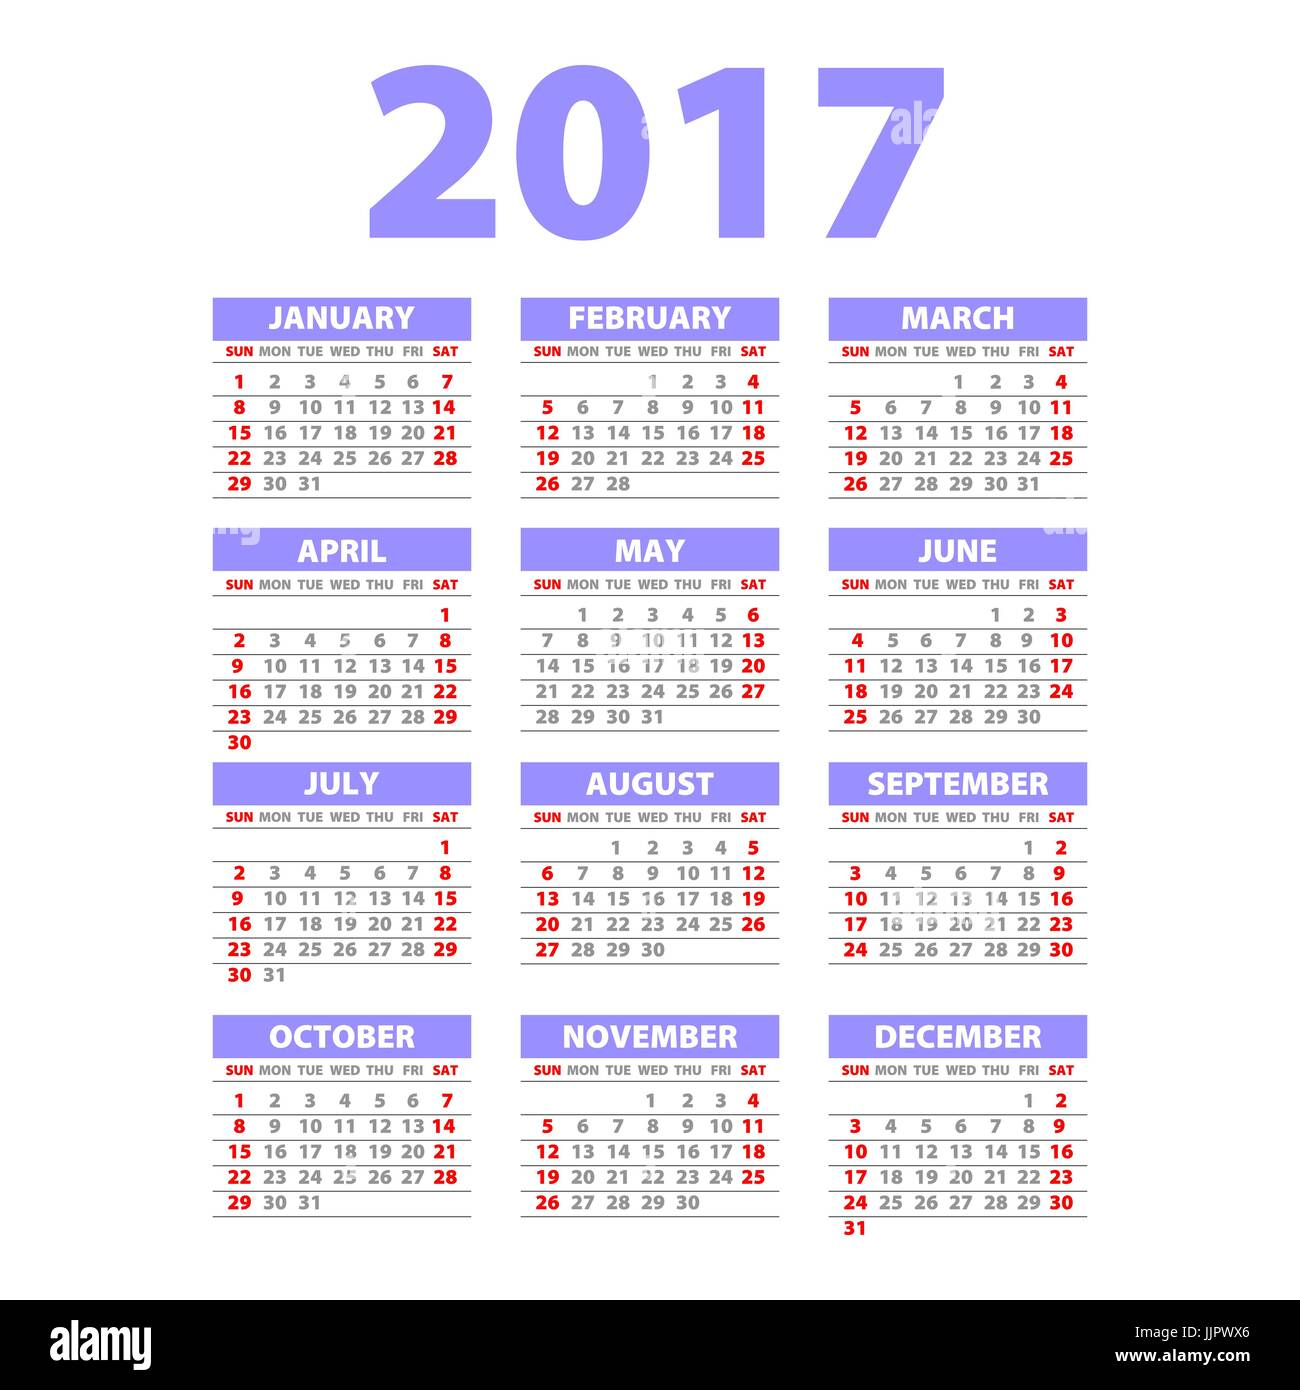 wallpapers 2017 Poster Calendar Template https www alamy com stock photo paper style 2017 full calendar template promotion poster vector design 149250030 html